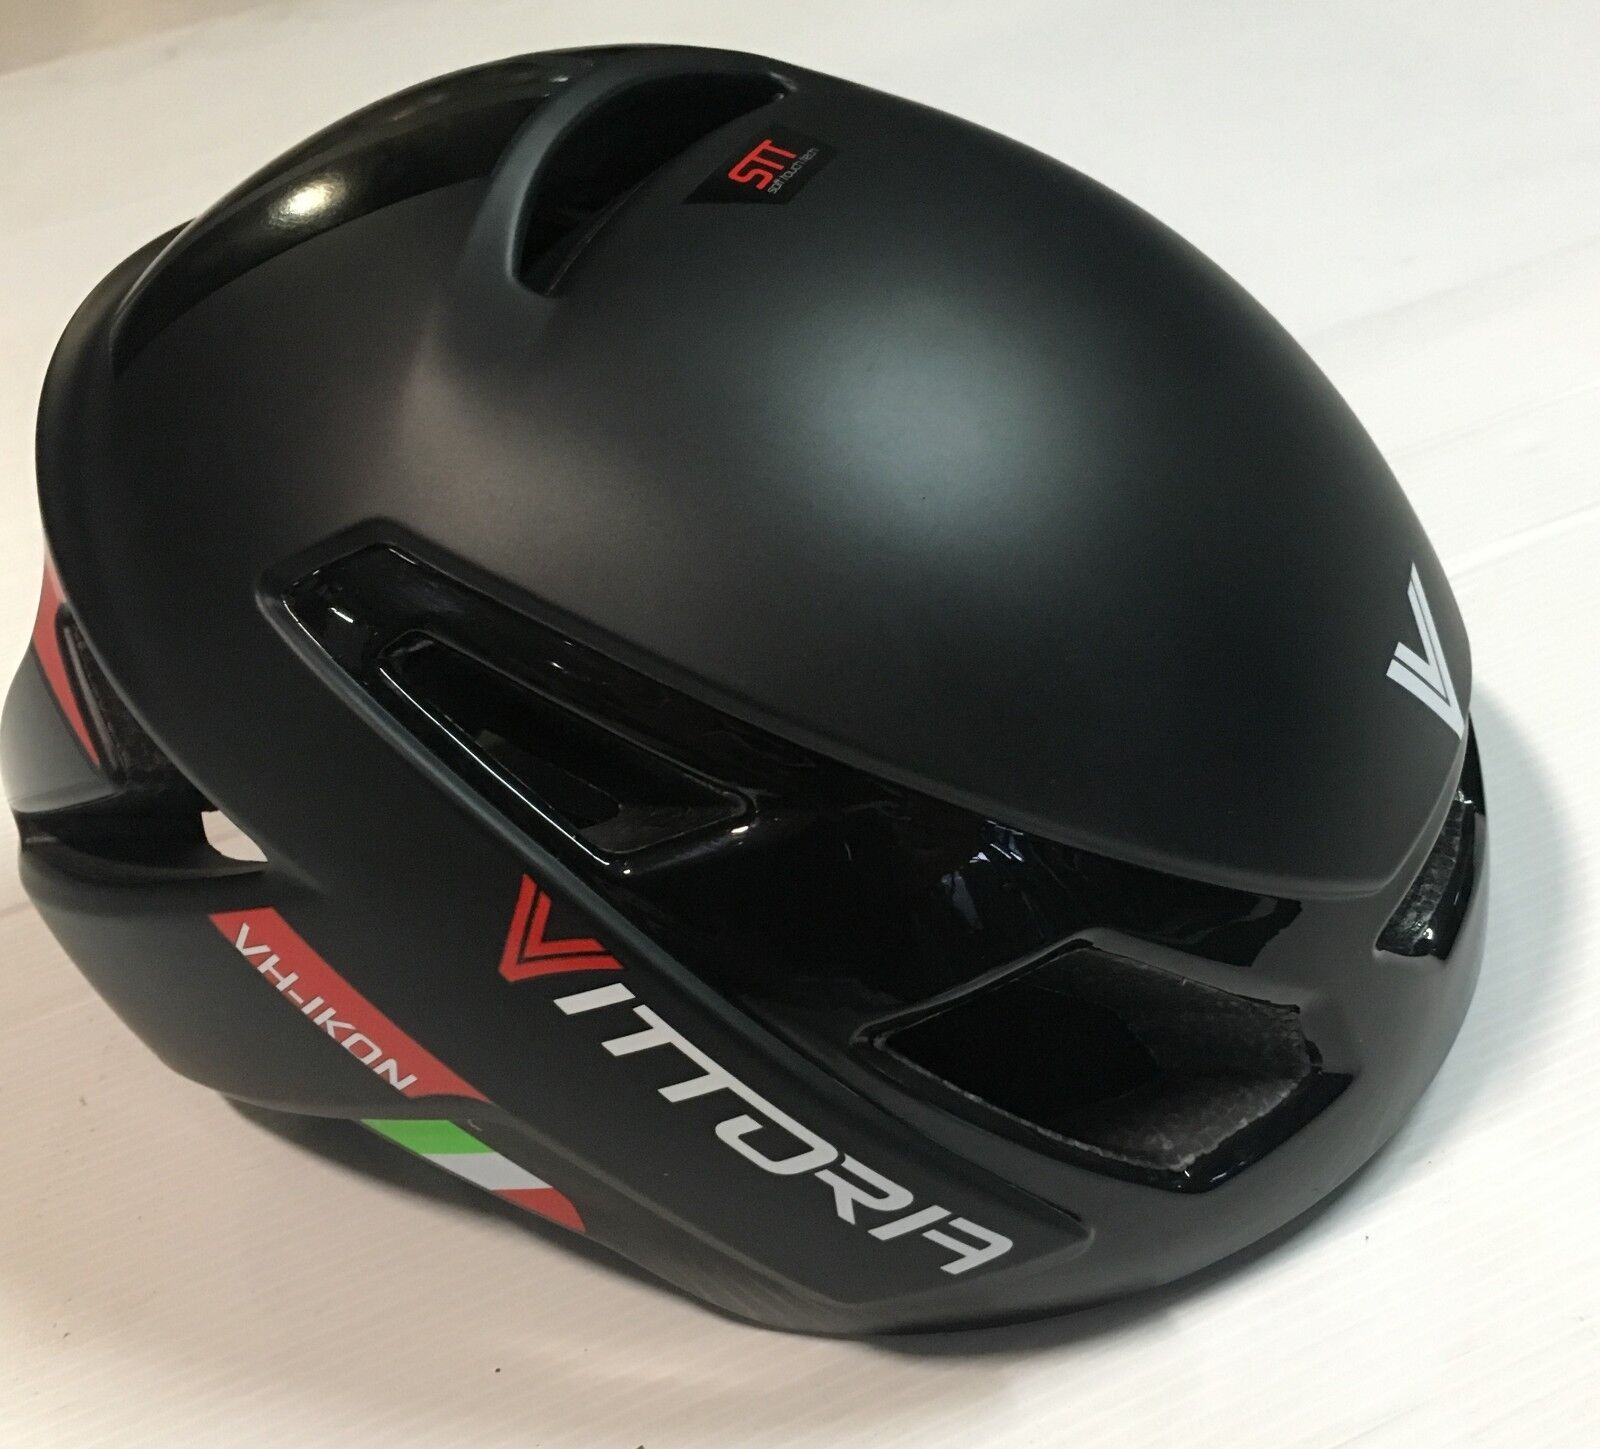 Casco bici corsa Vittoria VH Ikon negro negro road bike helmet L-XL 58-62 cm